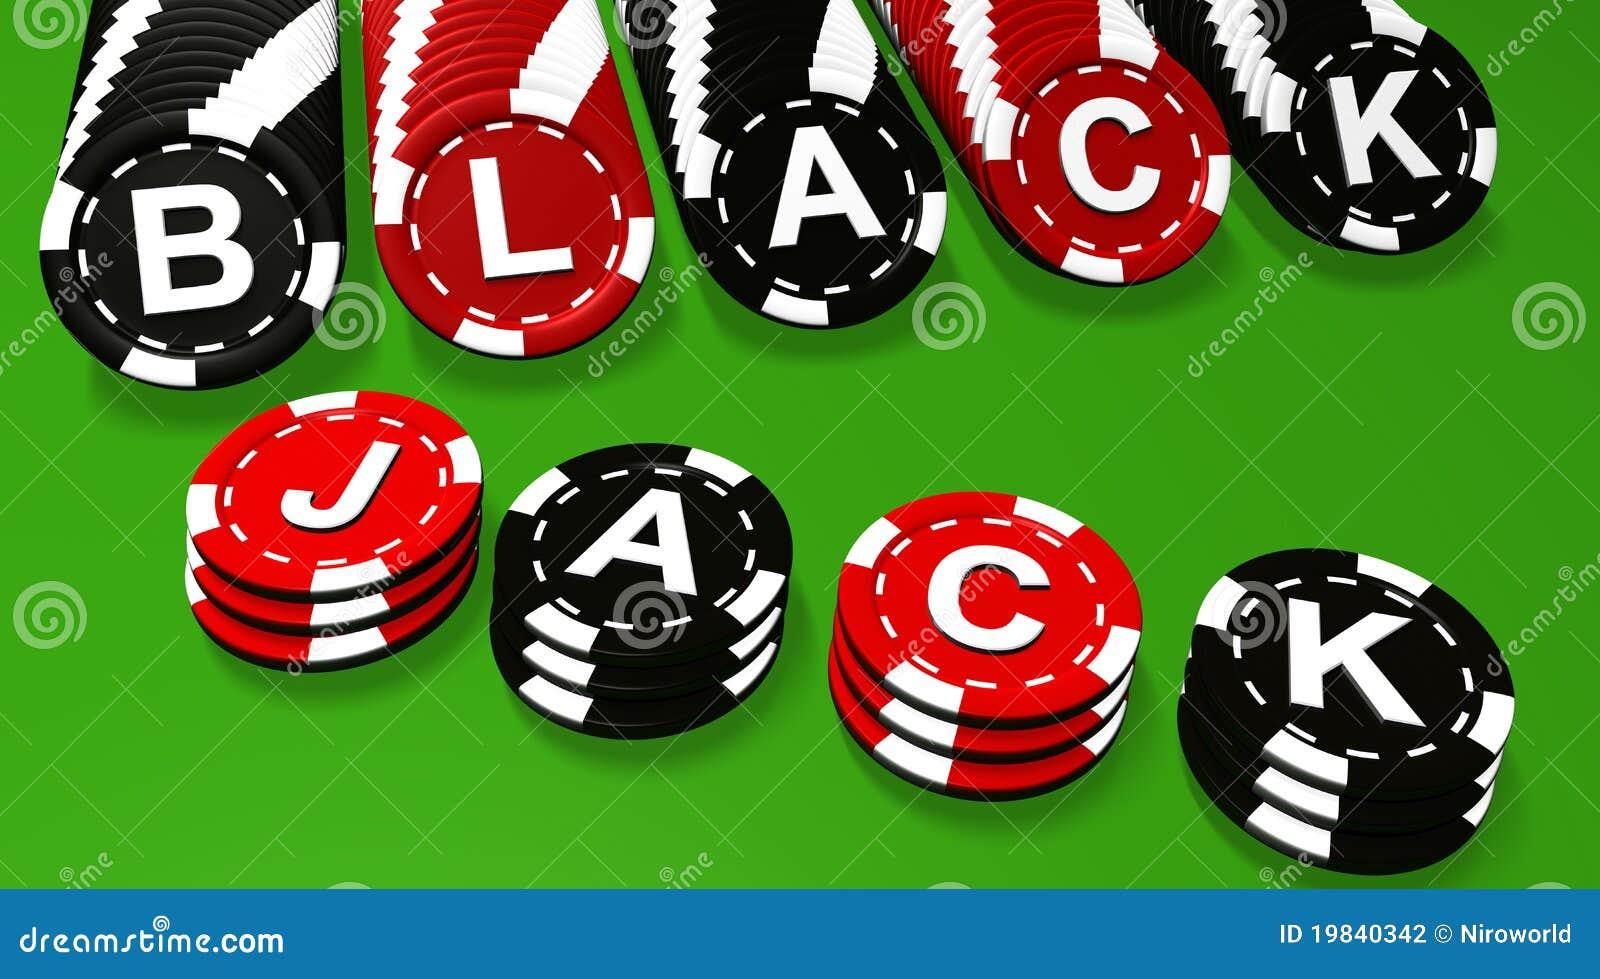 Entertainment poker web casino 14